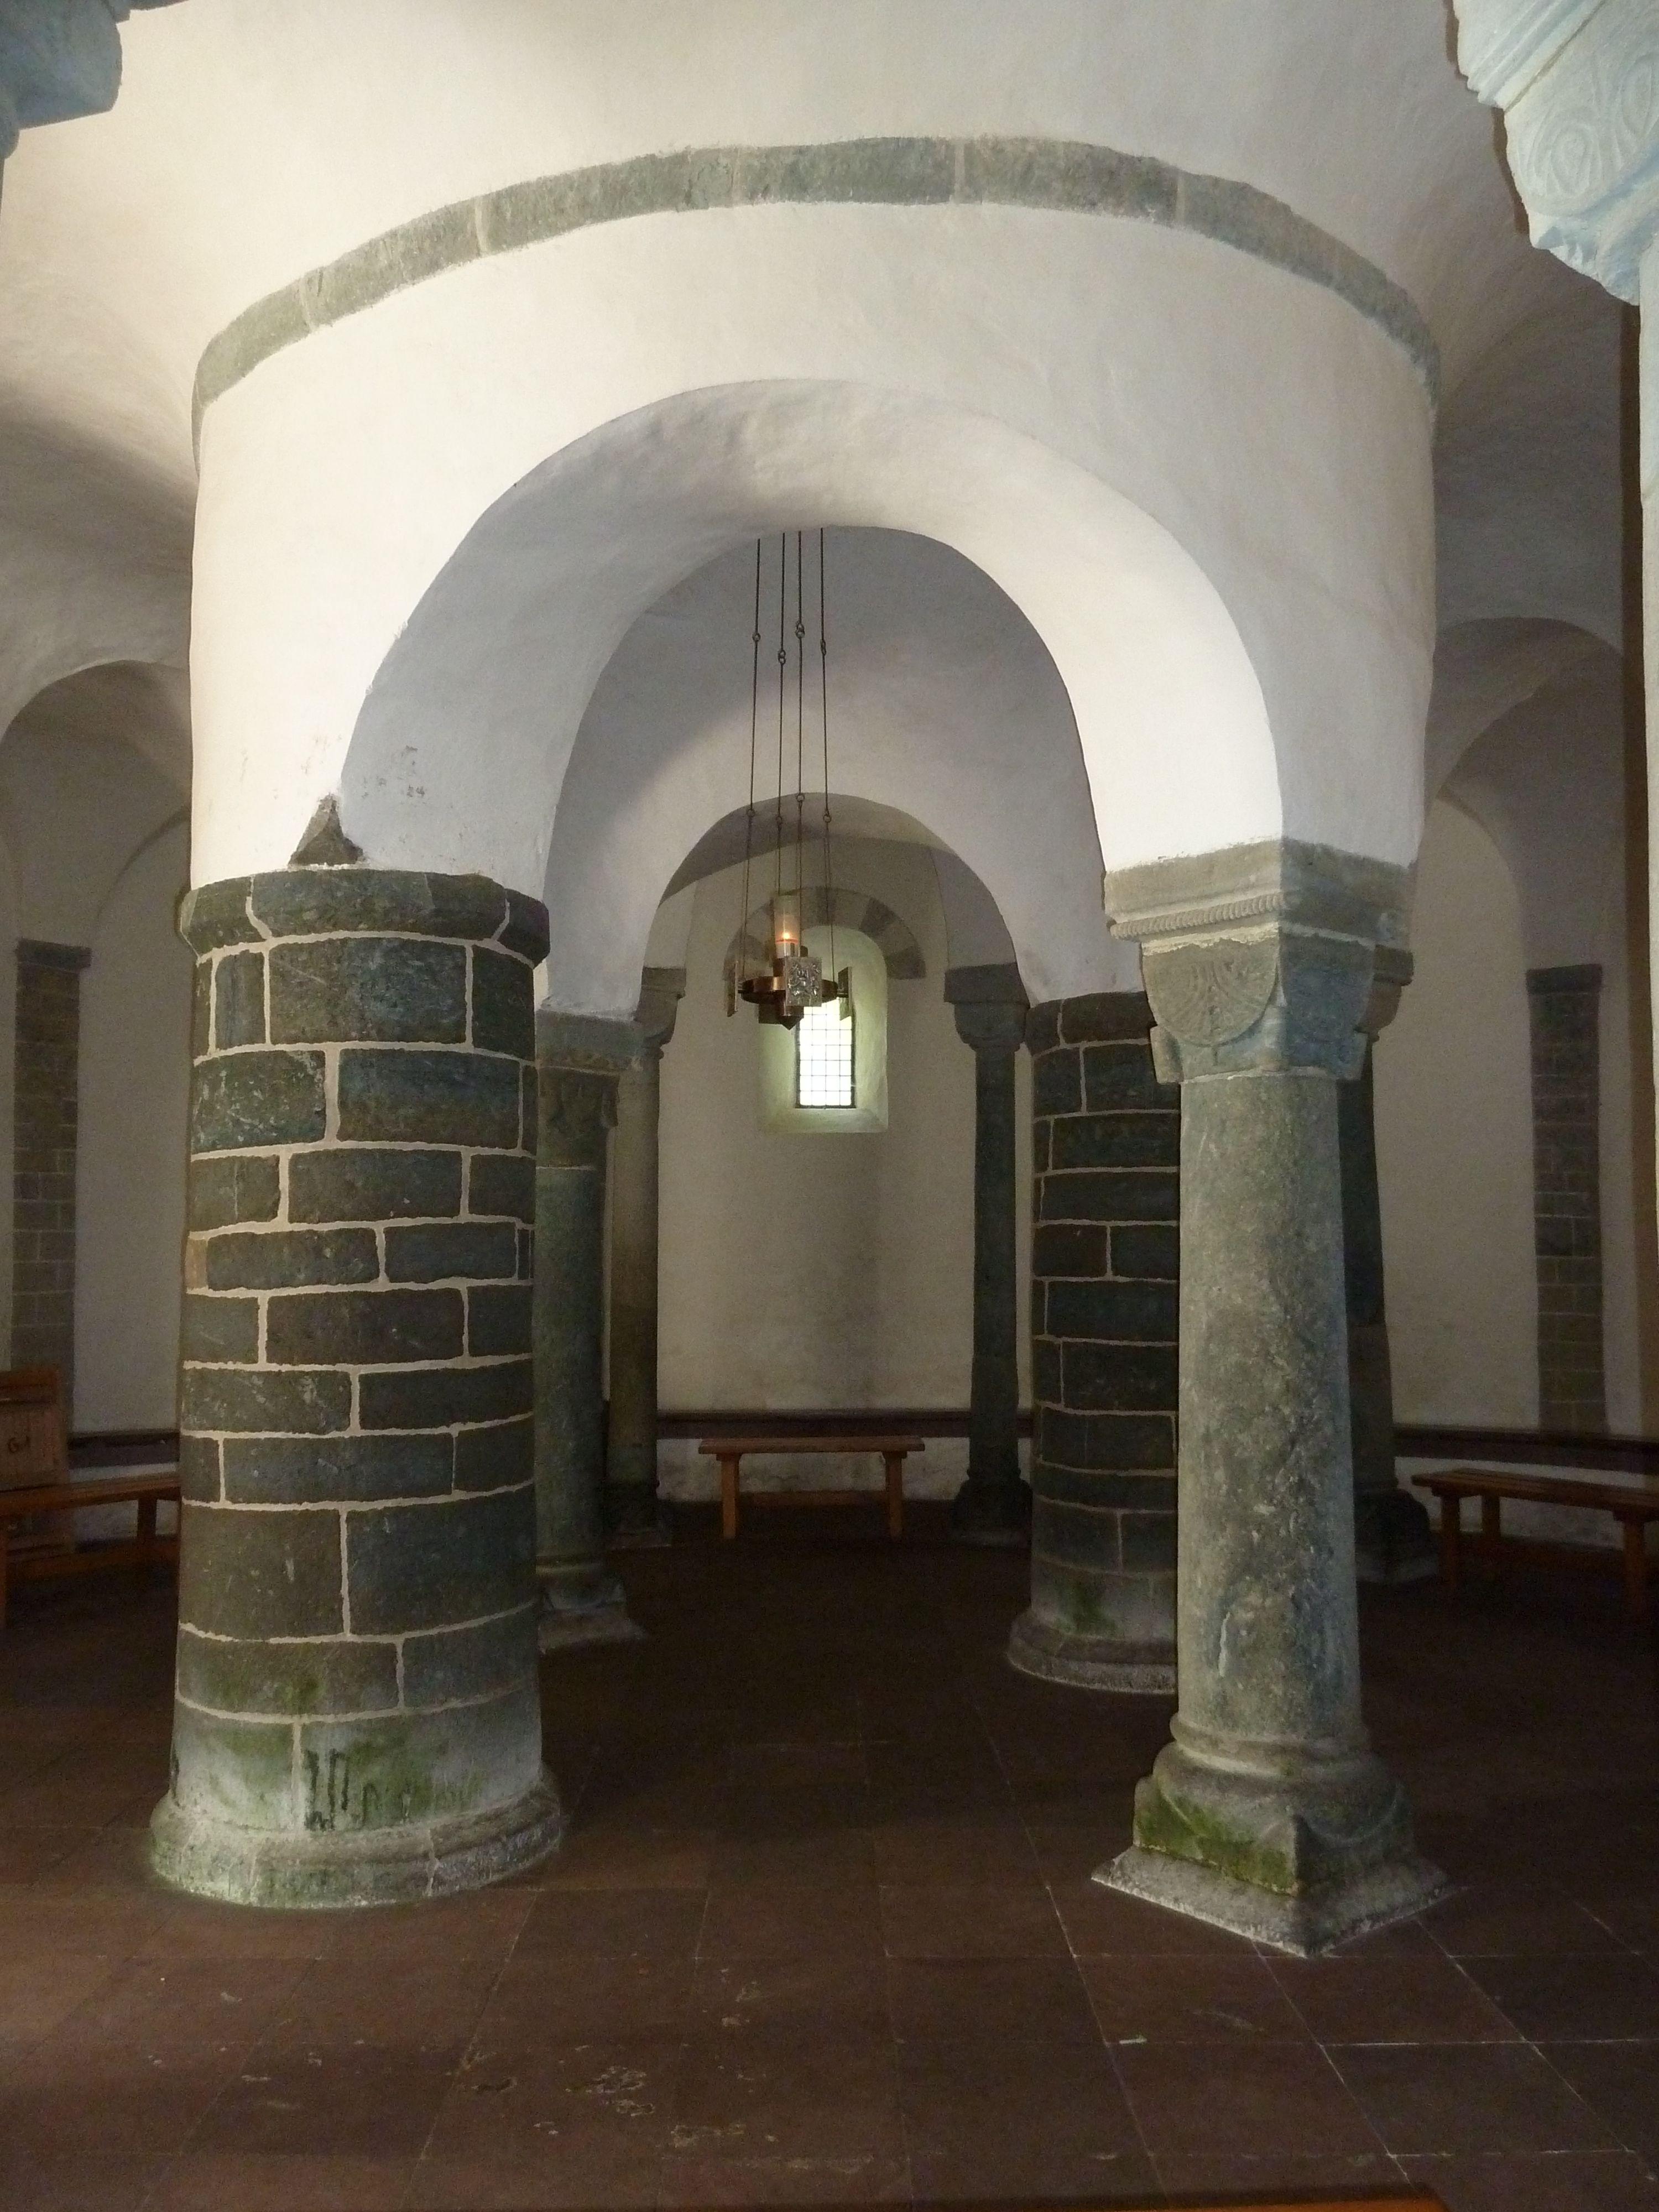 Drüggelter Kapelle Innenkreis, Zwei Pfeiler und zwei Säulen.